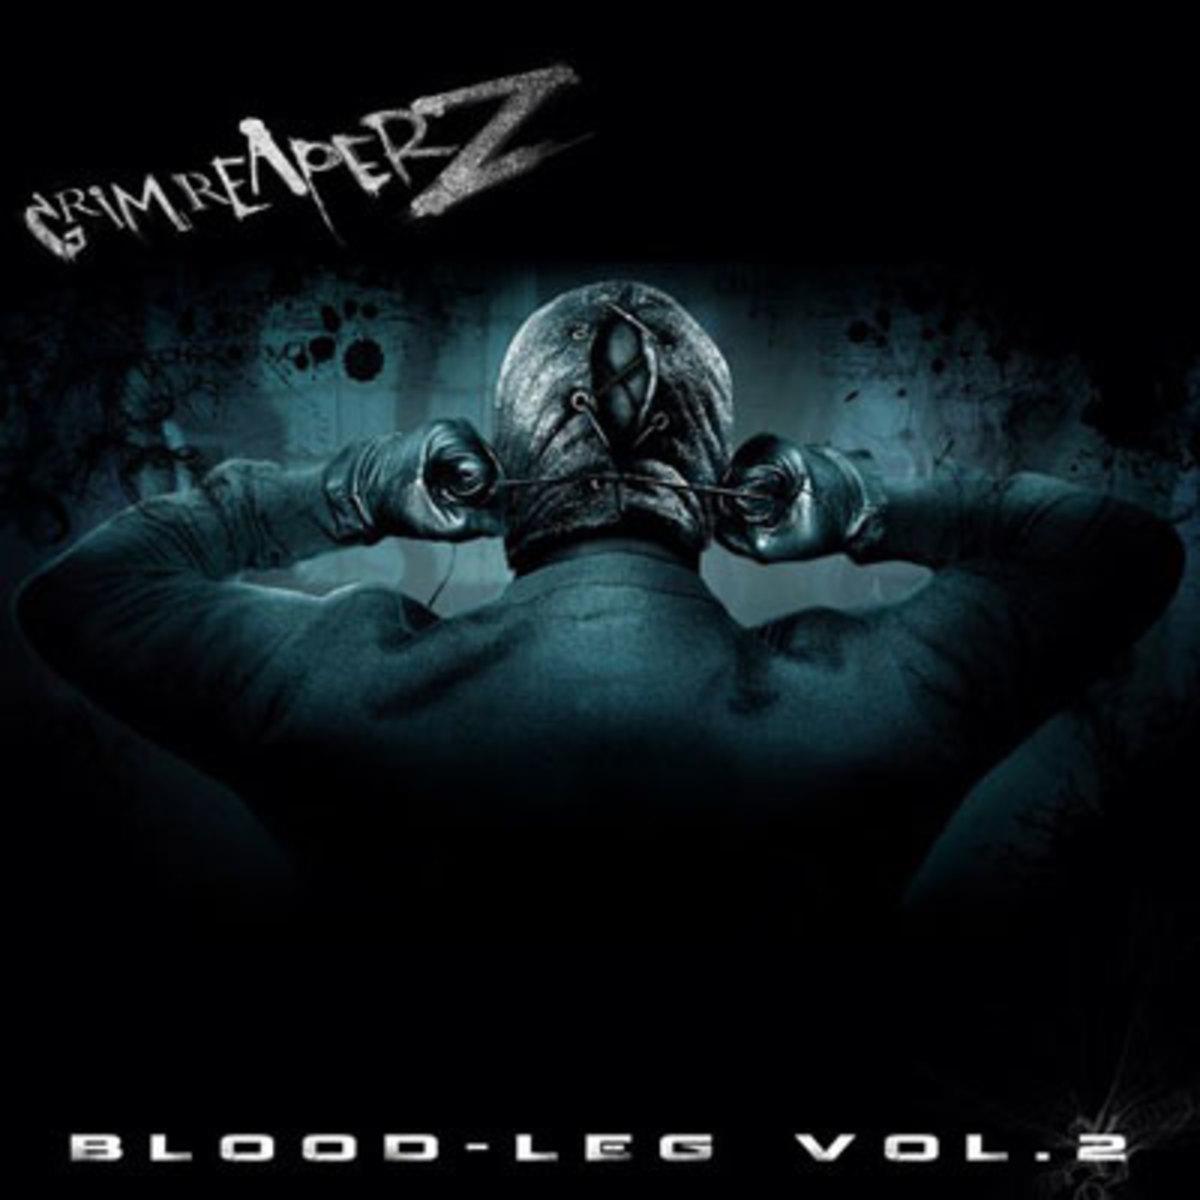 grimreaperz-bloodlegv2.jpg